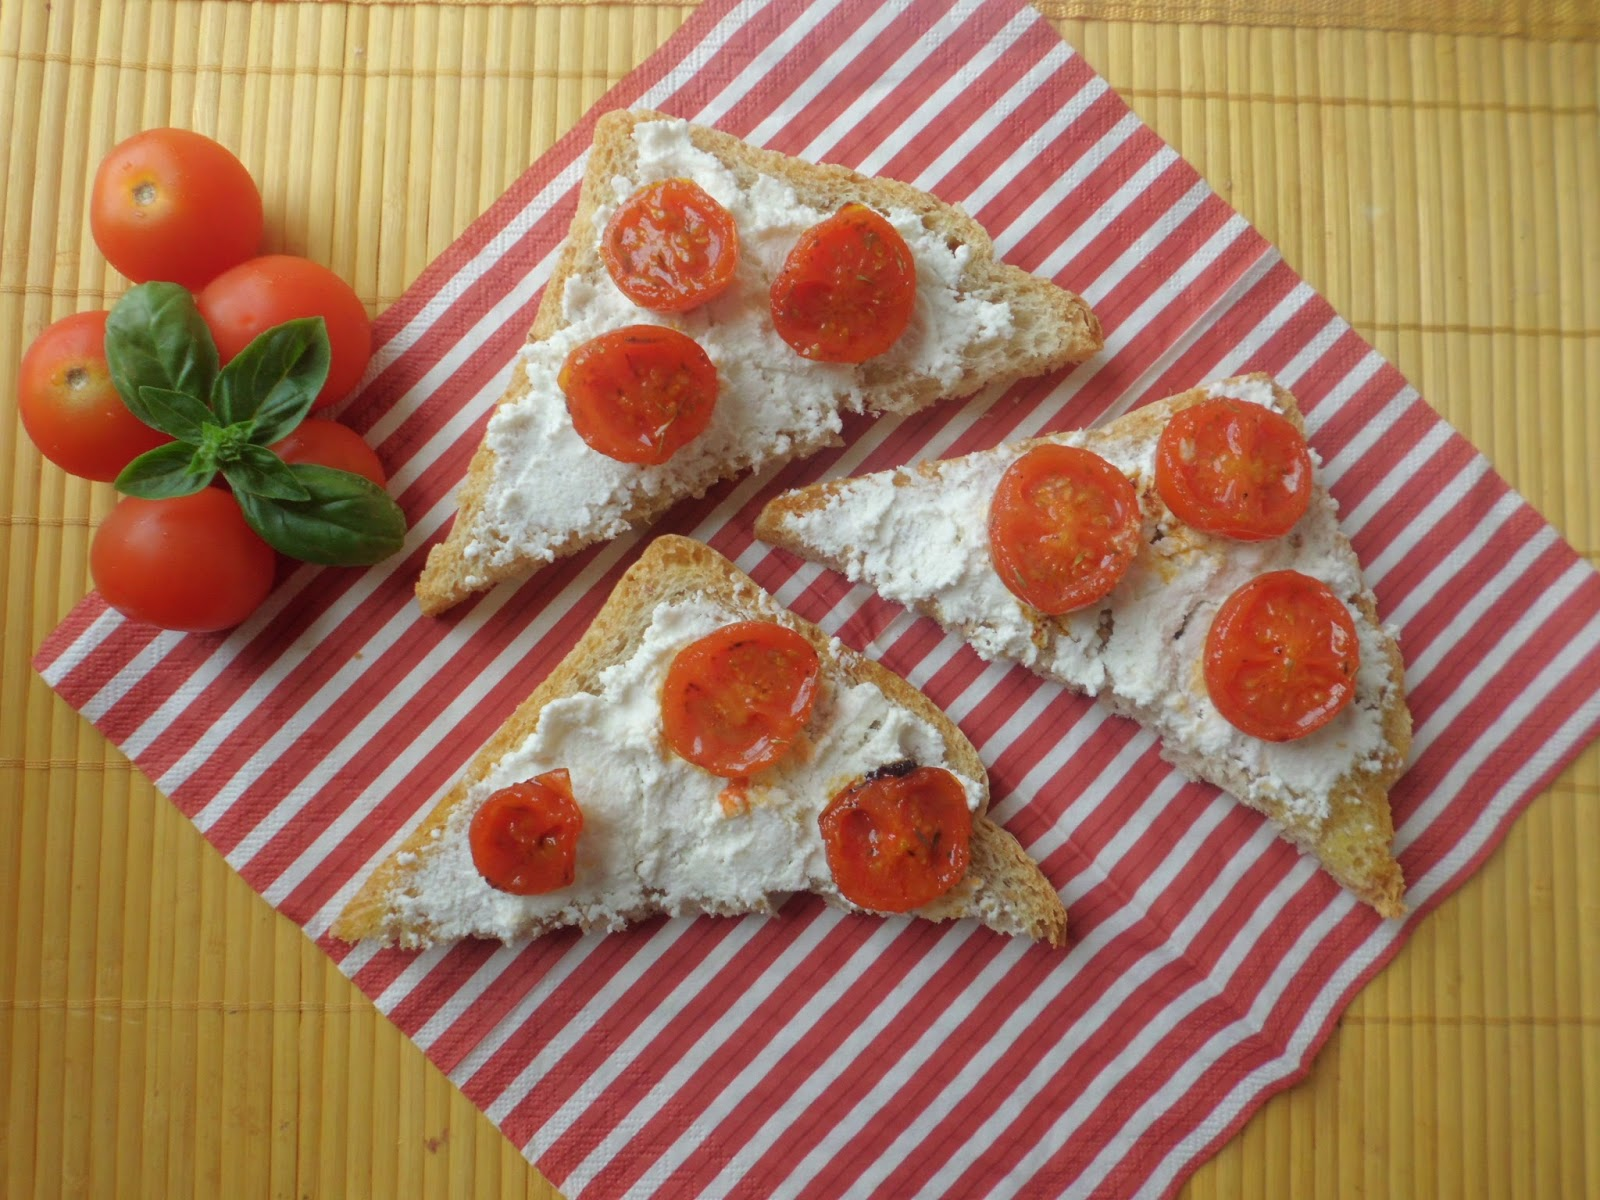 crostoni con pomodorini caramellati